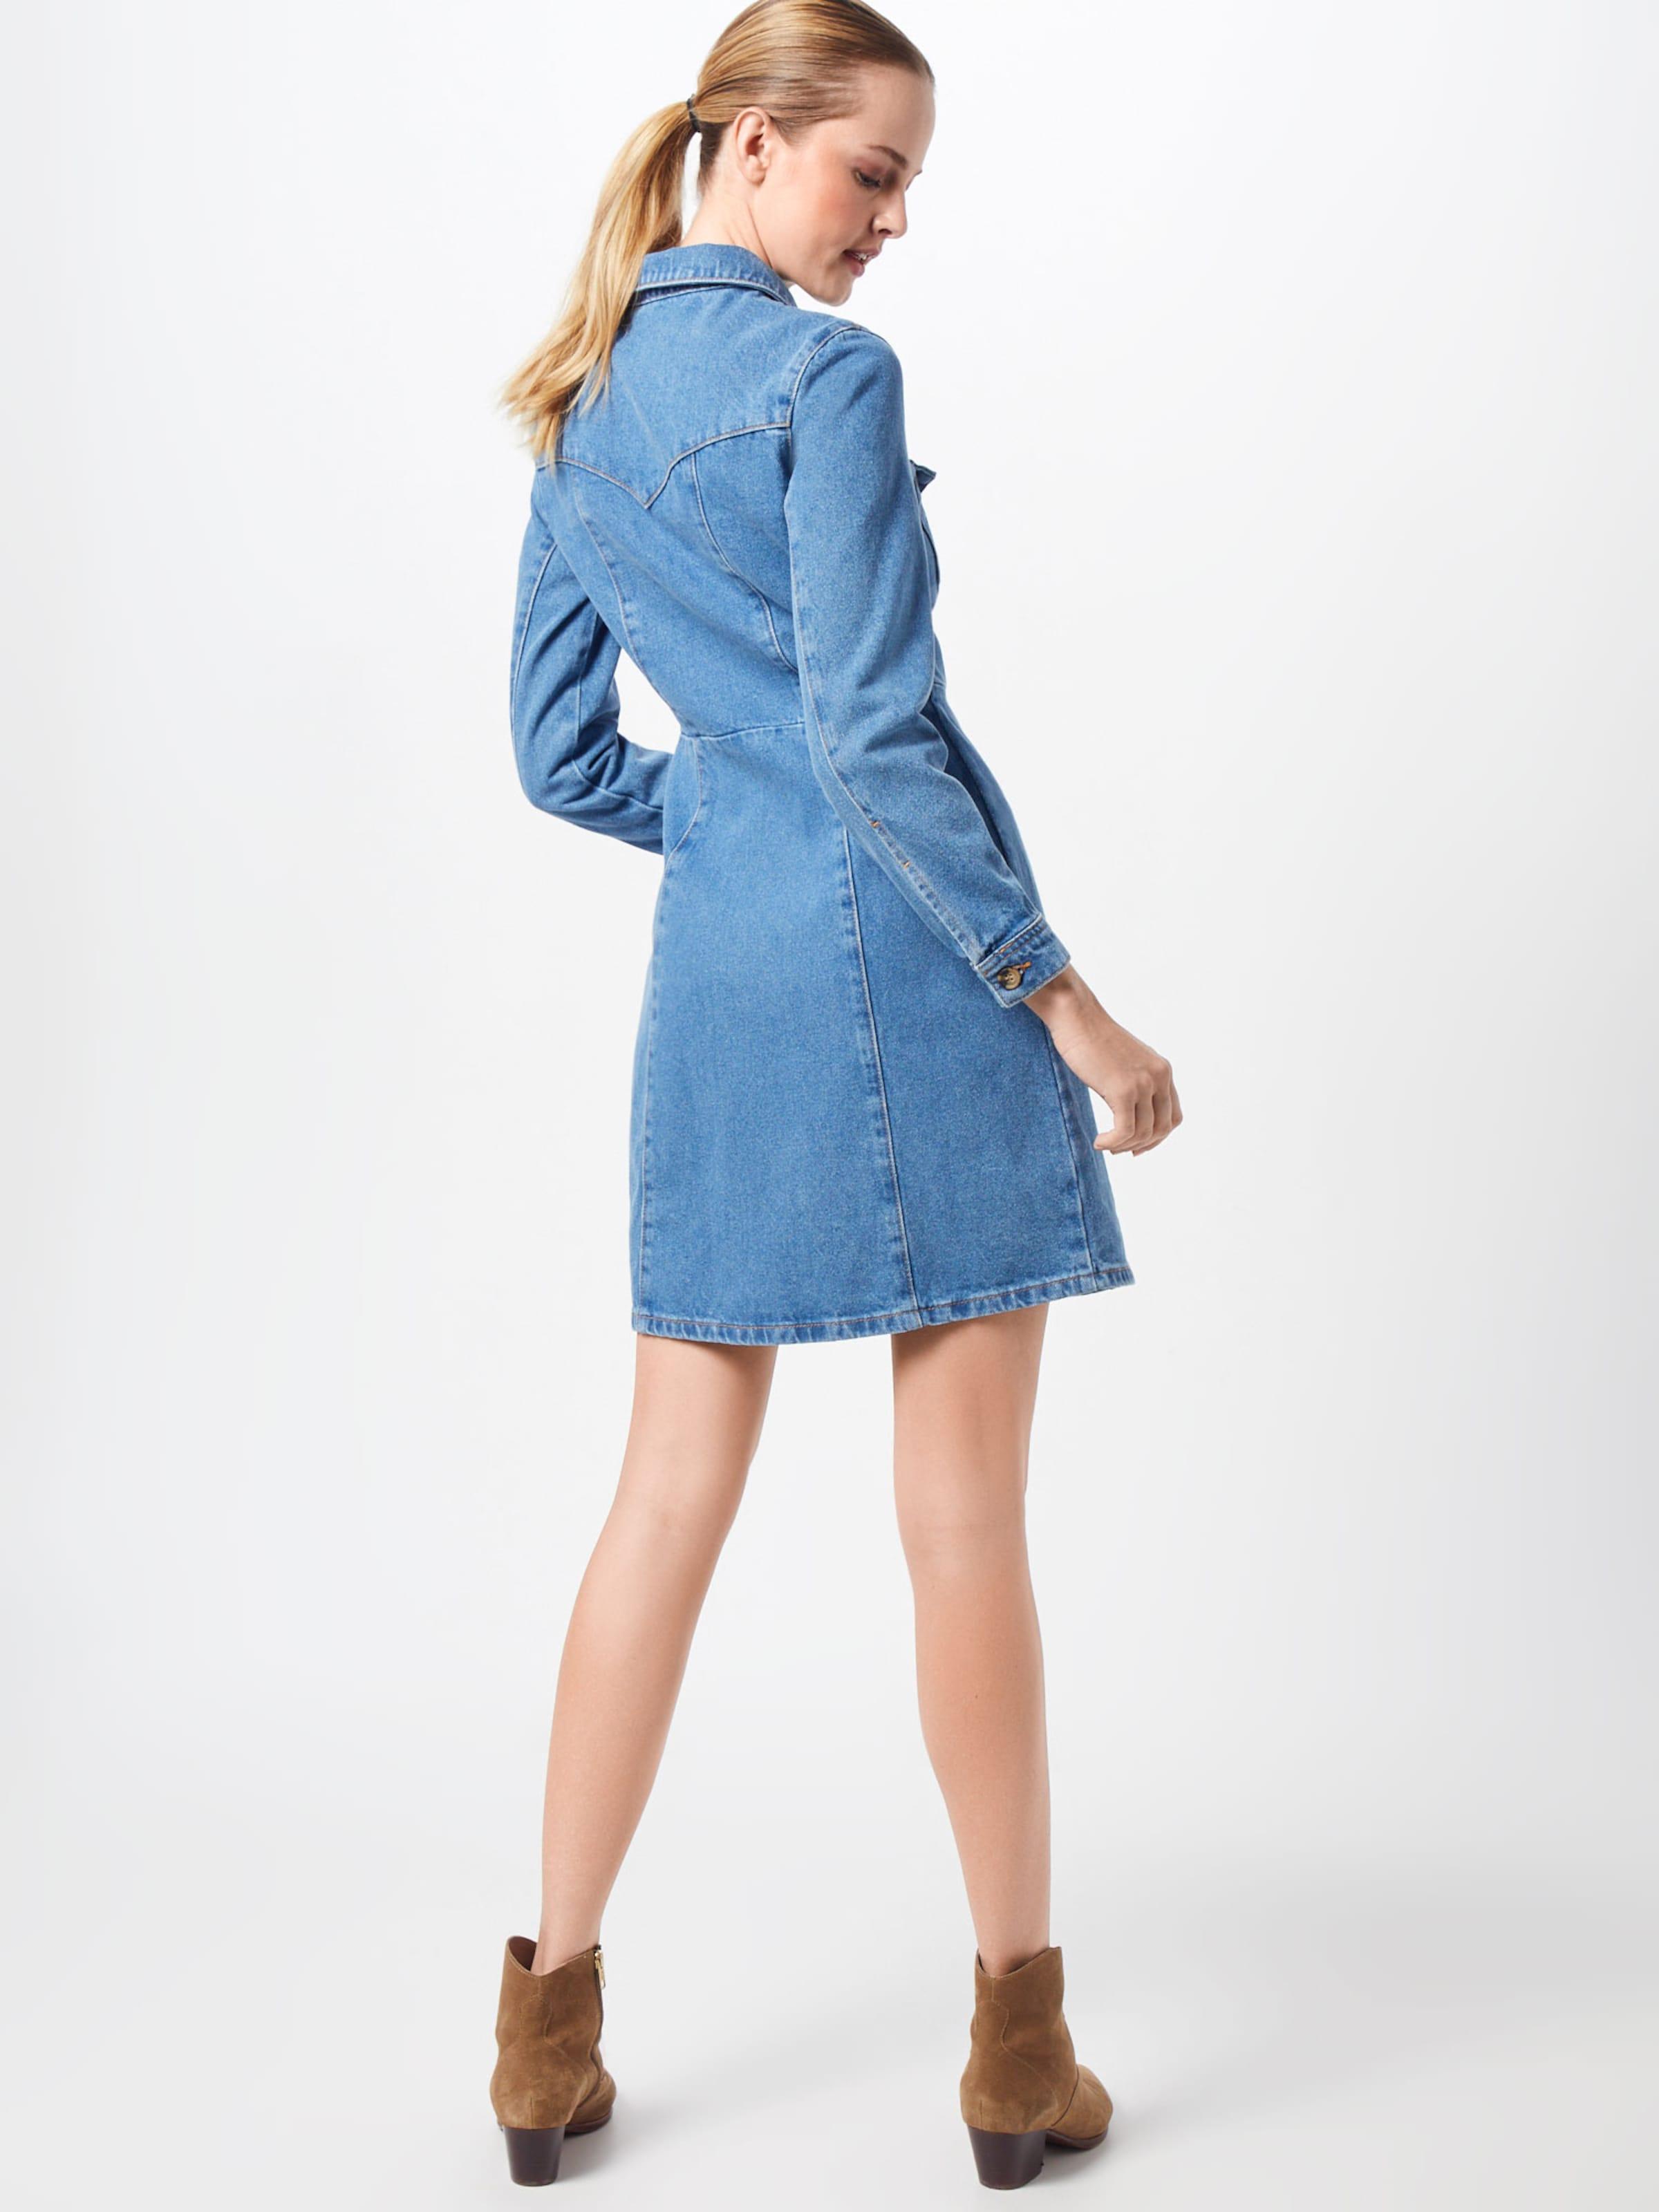 X Emre En You Robe Bleu chemise 'ayana' Gizem Denim About LpVqSUGMz